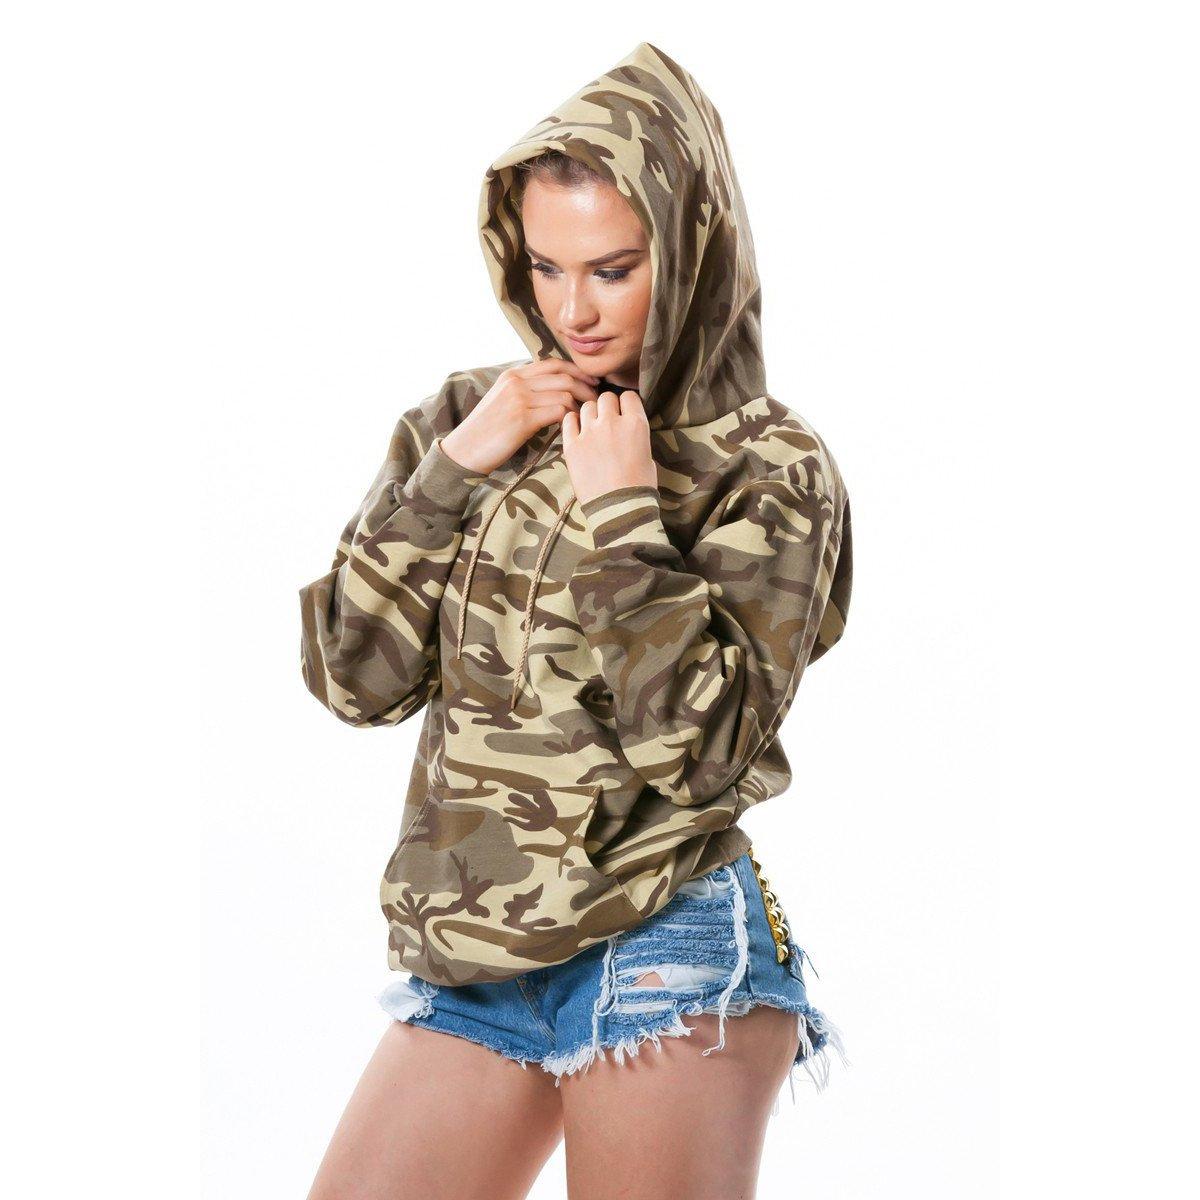 Langarm Milit/är Camo TarnungKapuze Kapuzenpullover Hoodie Thick Warm Sweatshirt T-Shirt Oberteil Top